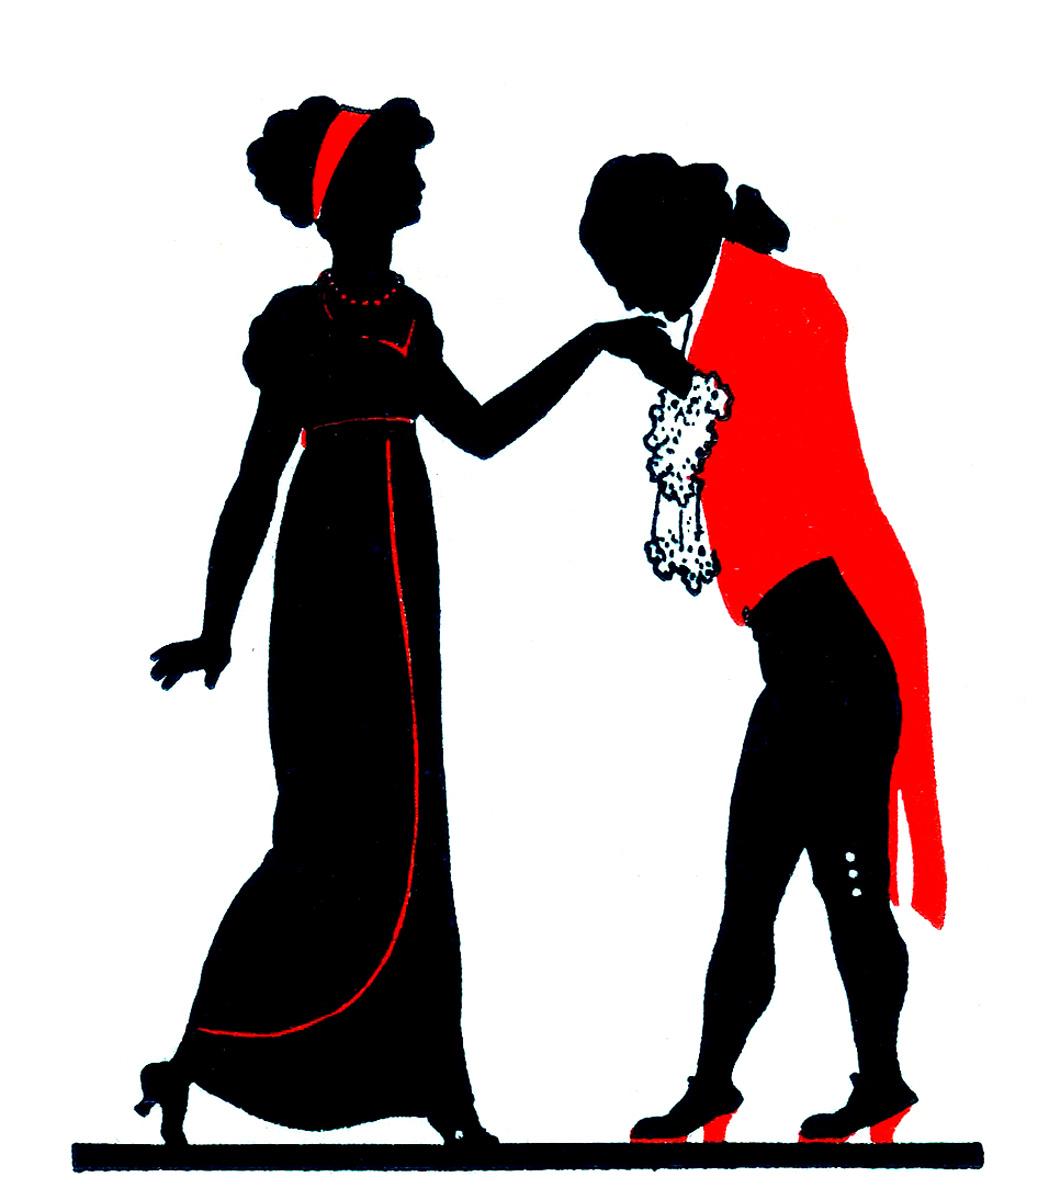 Valentine silhouette clipart freeuse 12 Vintage Valentine Silhouettes! - The Graphics Fairy freeuse